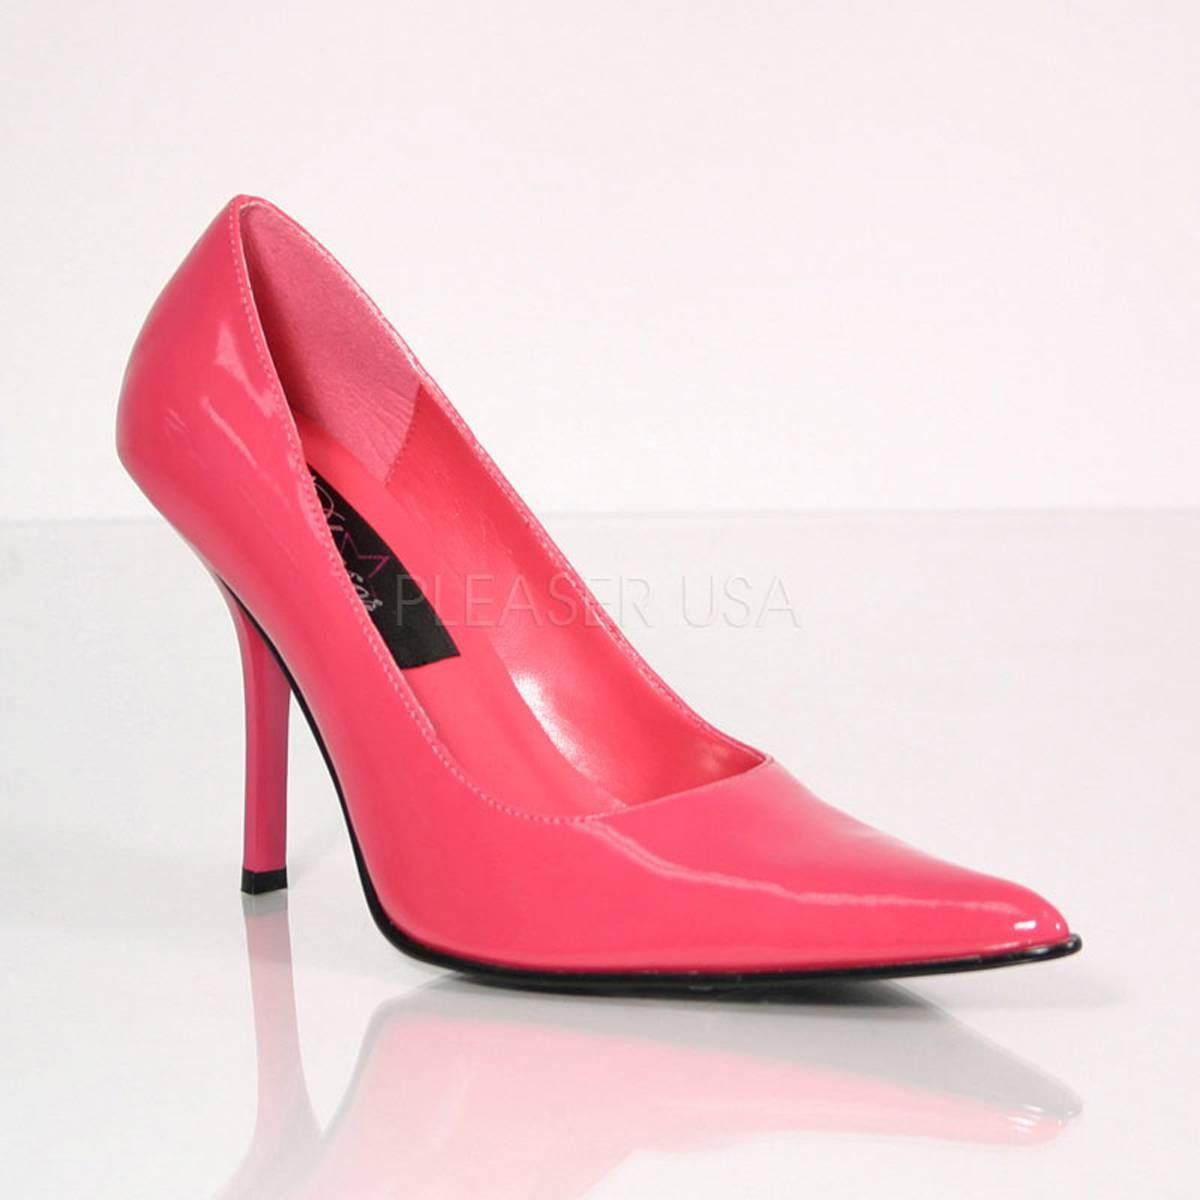 Pumps - FOXY 01 ° Damen Pumps ° Pink Glänzend ° Pleaser  - Onlineshop RedSixty